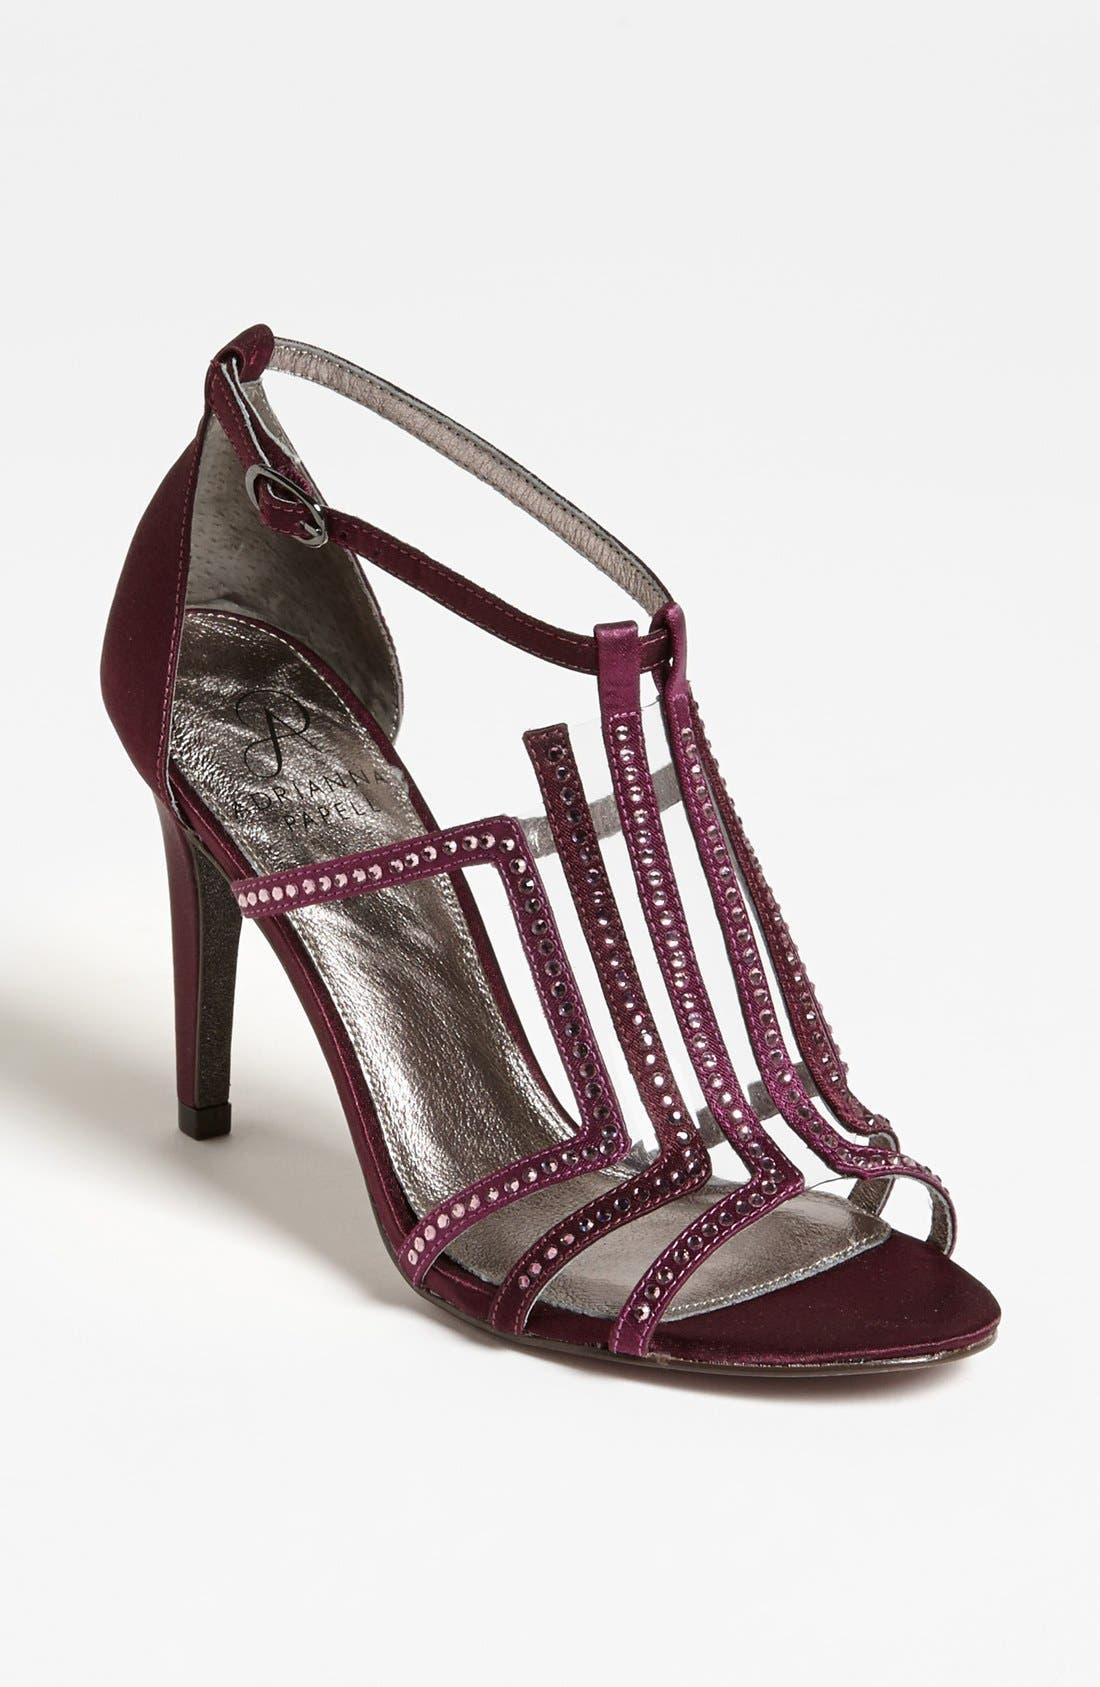 Main Image - Adrianna Papell 'Emilia' Sandal